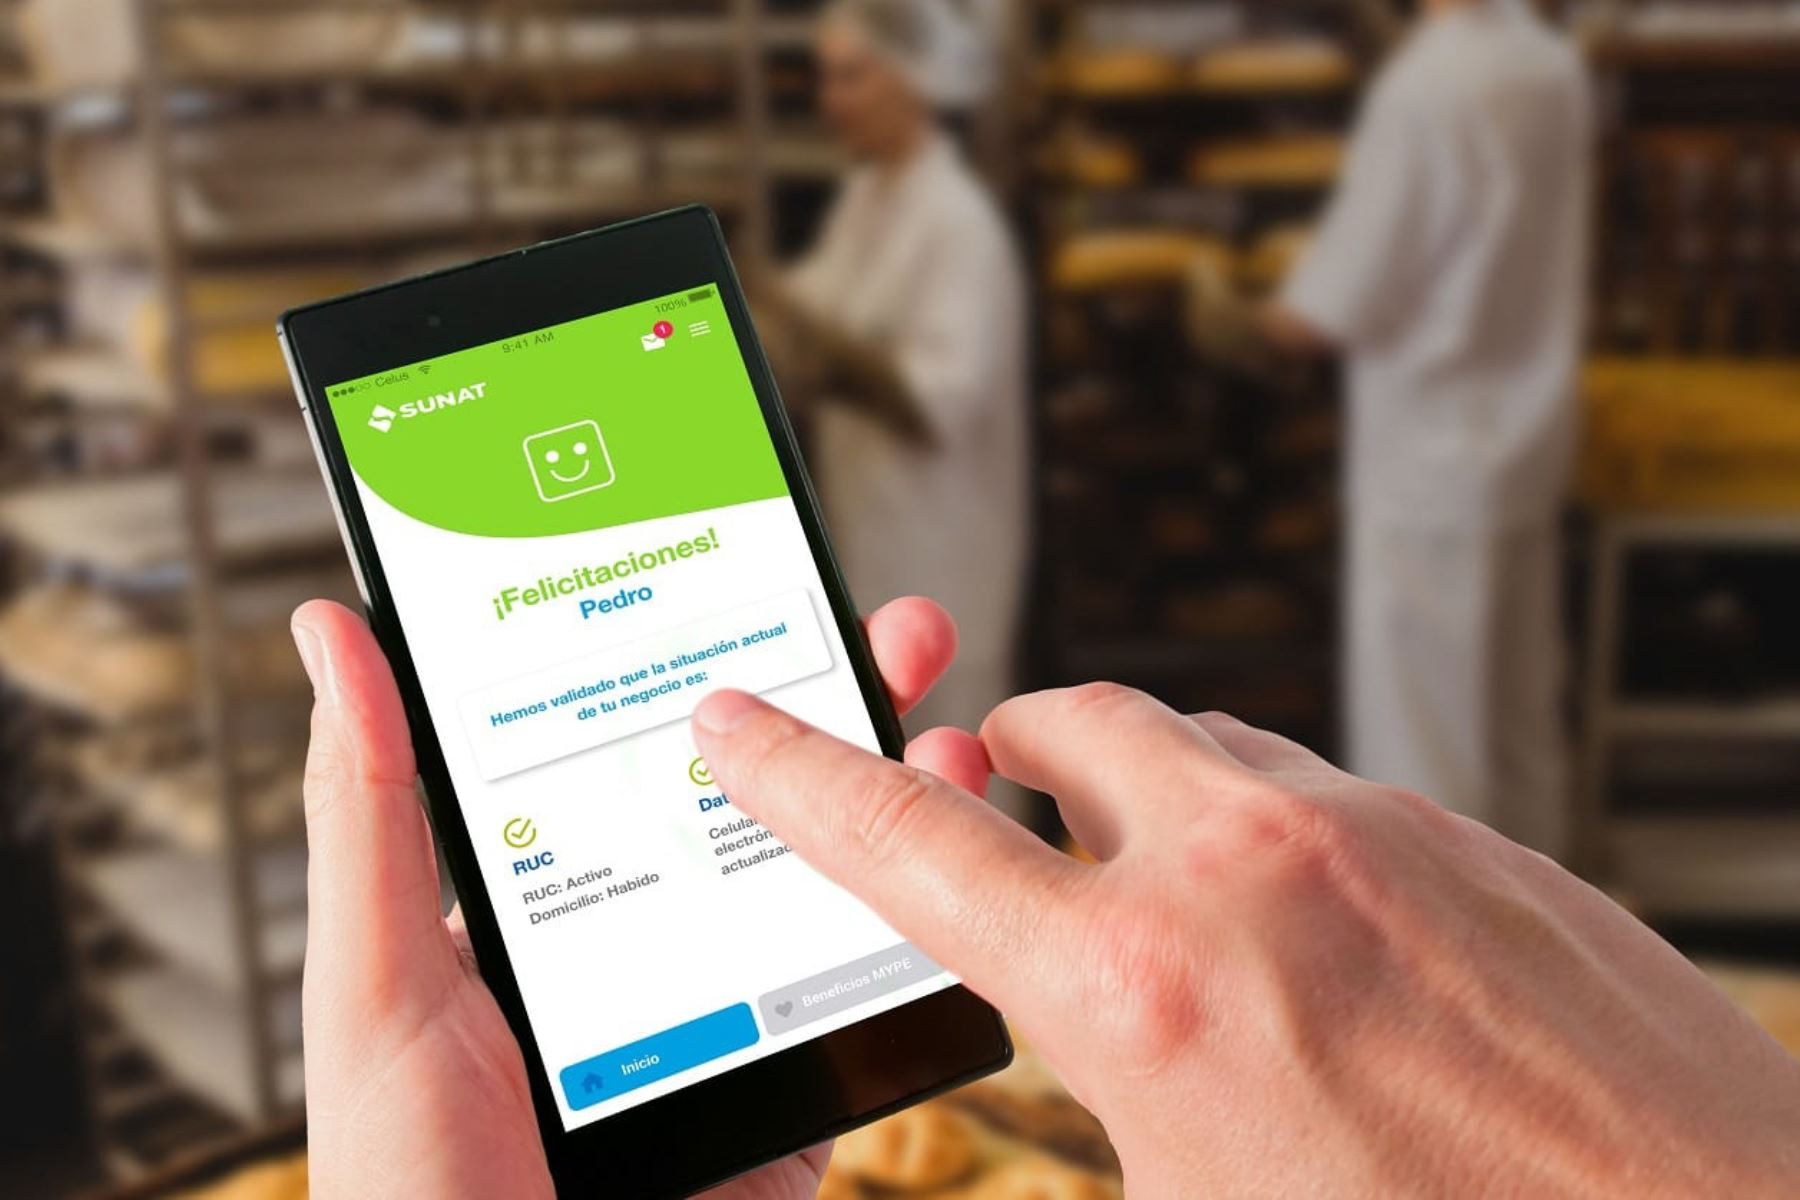 Emite facturas desde tu smartphone